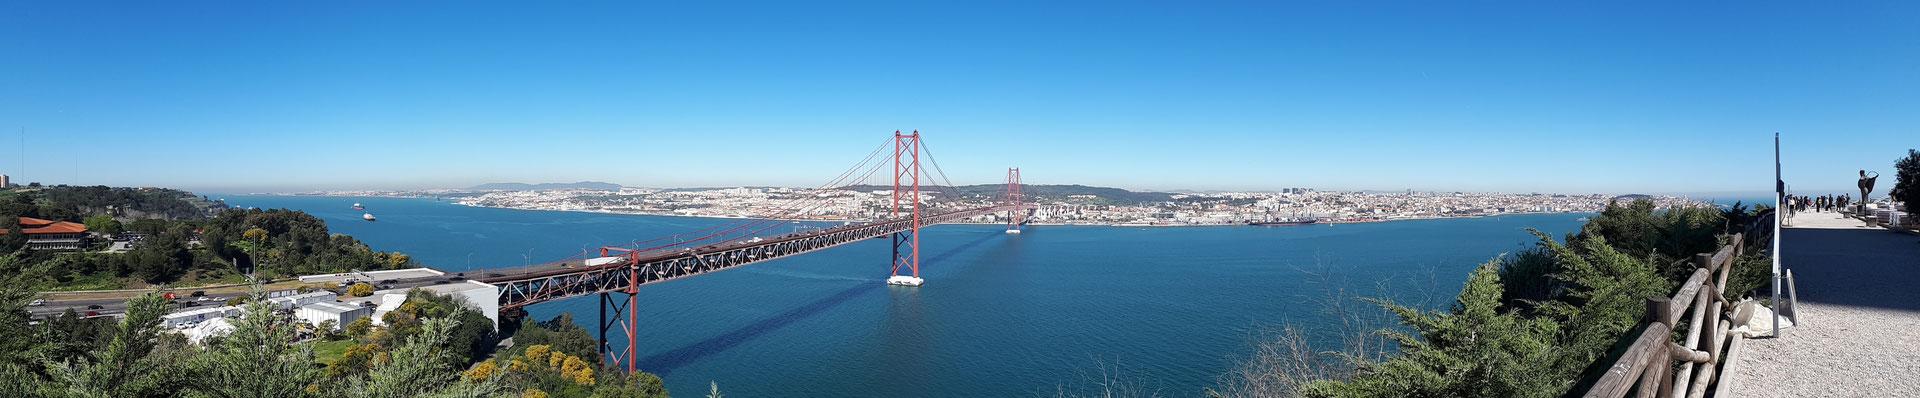 Uitzicht over de Ponte 25 de Abril, de Taag en Lissabon